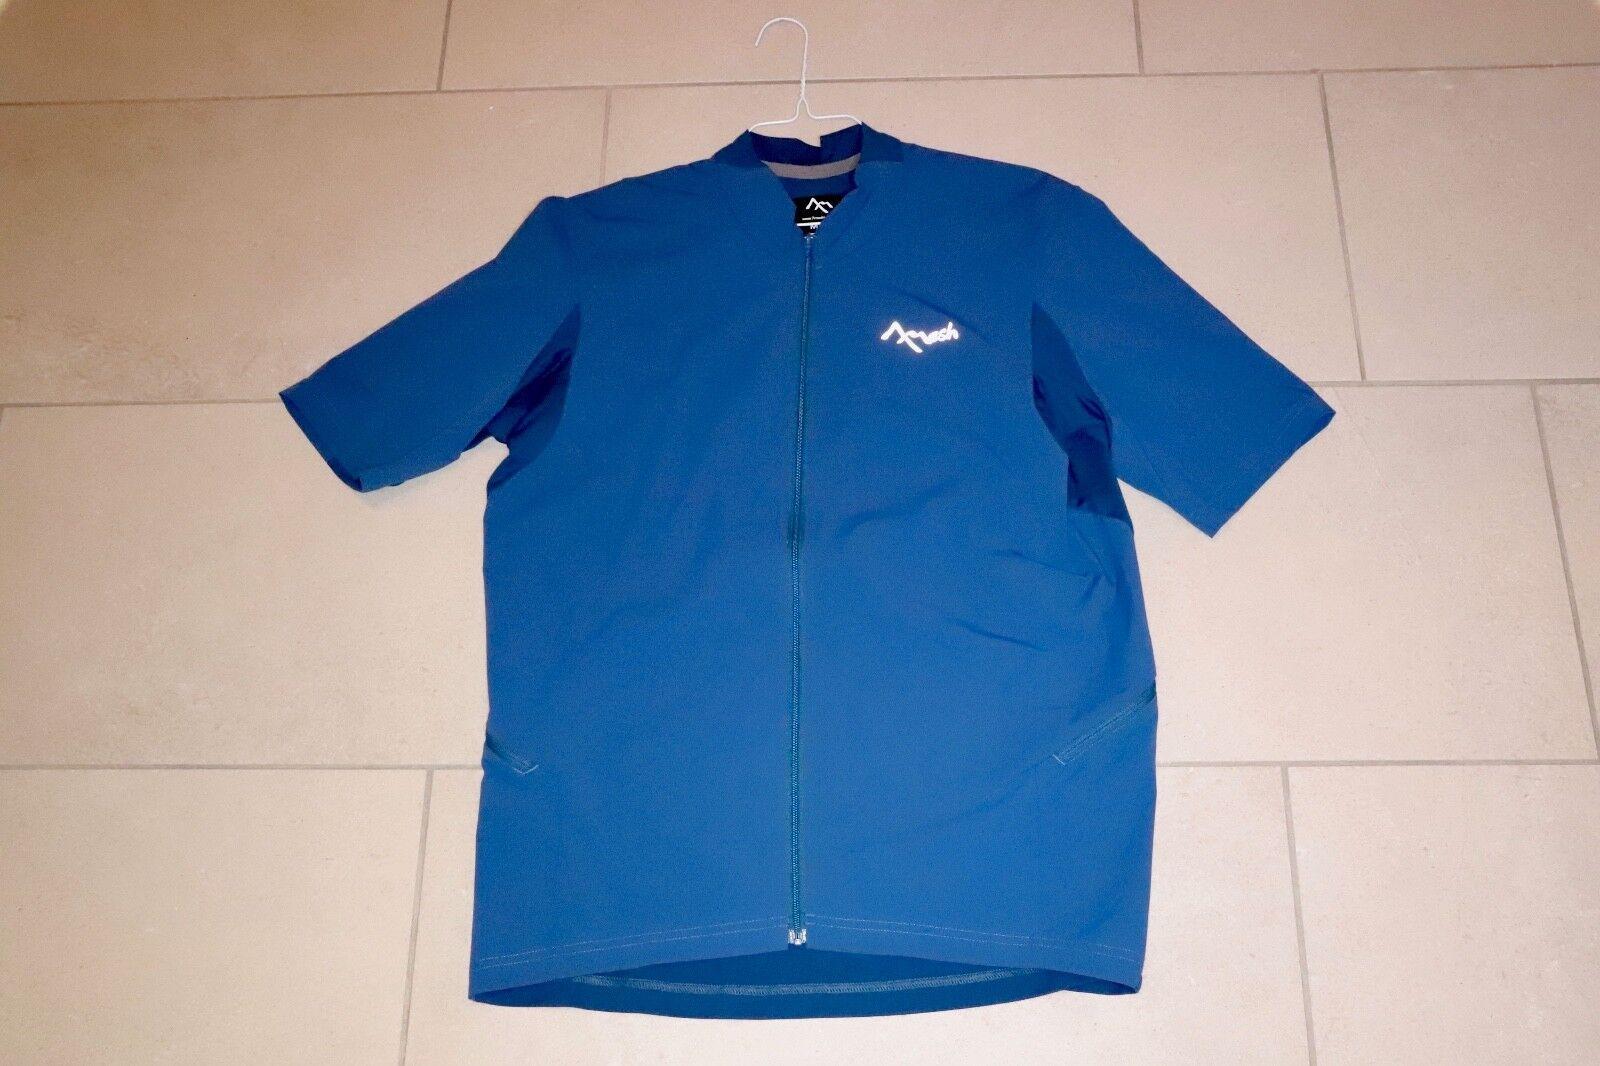 7mesh S2S Shirt, M's 2 Ball Blau, Jersey, Trikot VK 110,- Muster-Verkauf  30